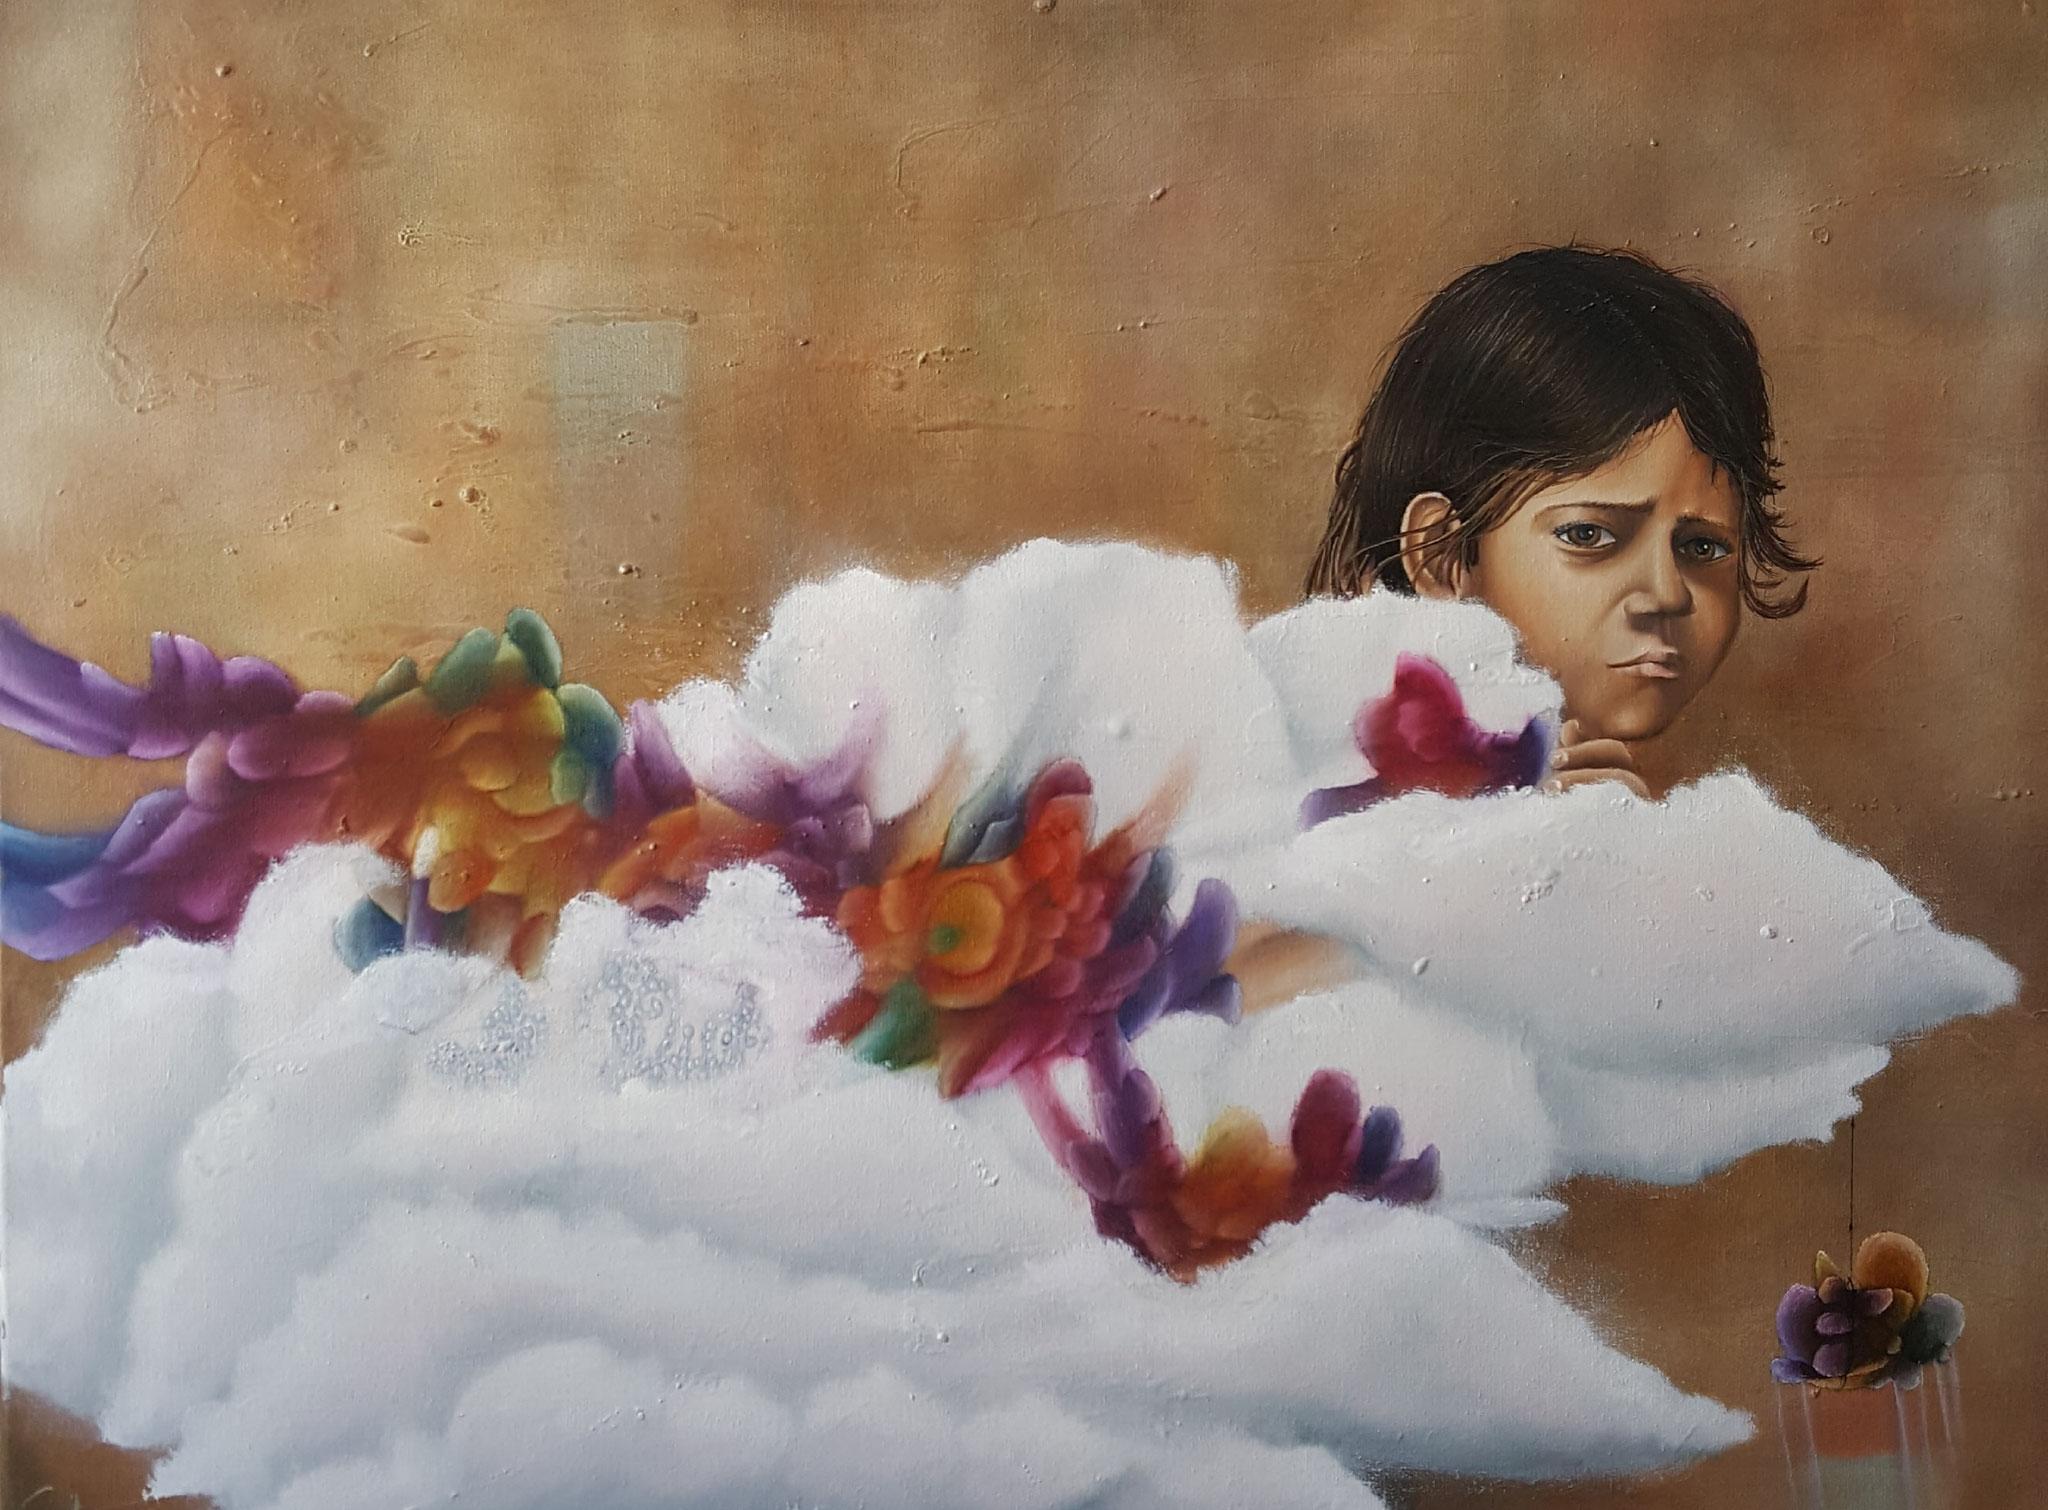 Cargador de sueños V, 2016, 80 x 60 cm, Óleo sobre lienzo